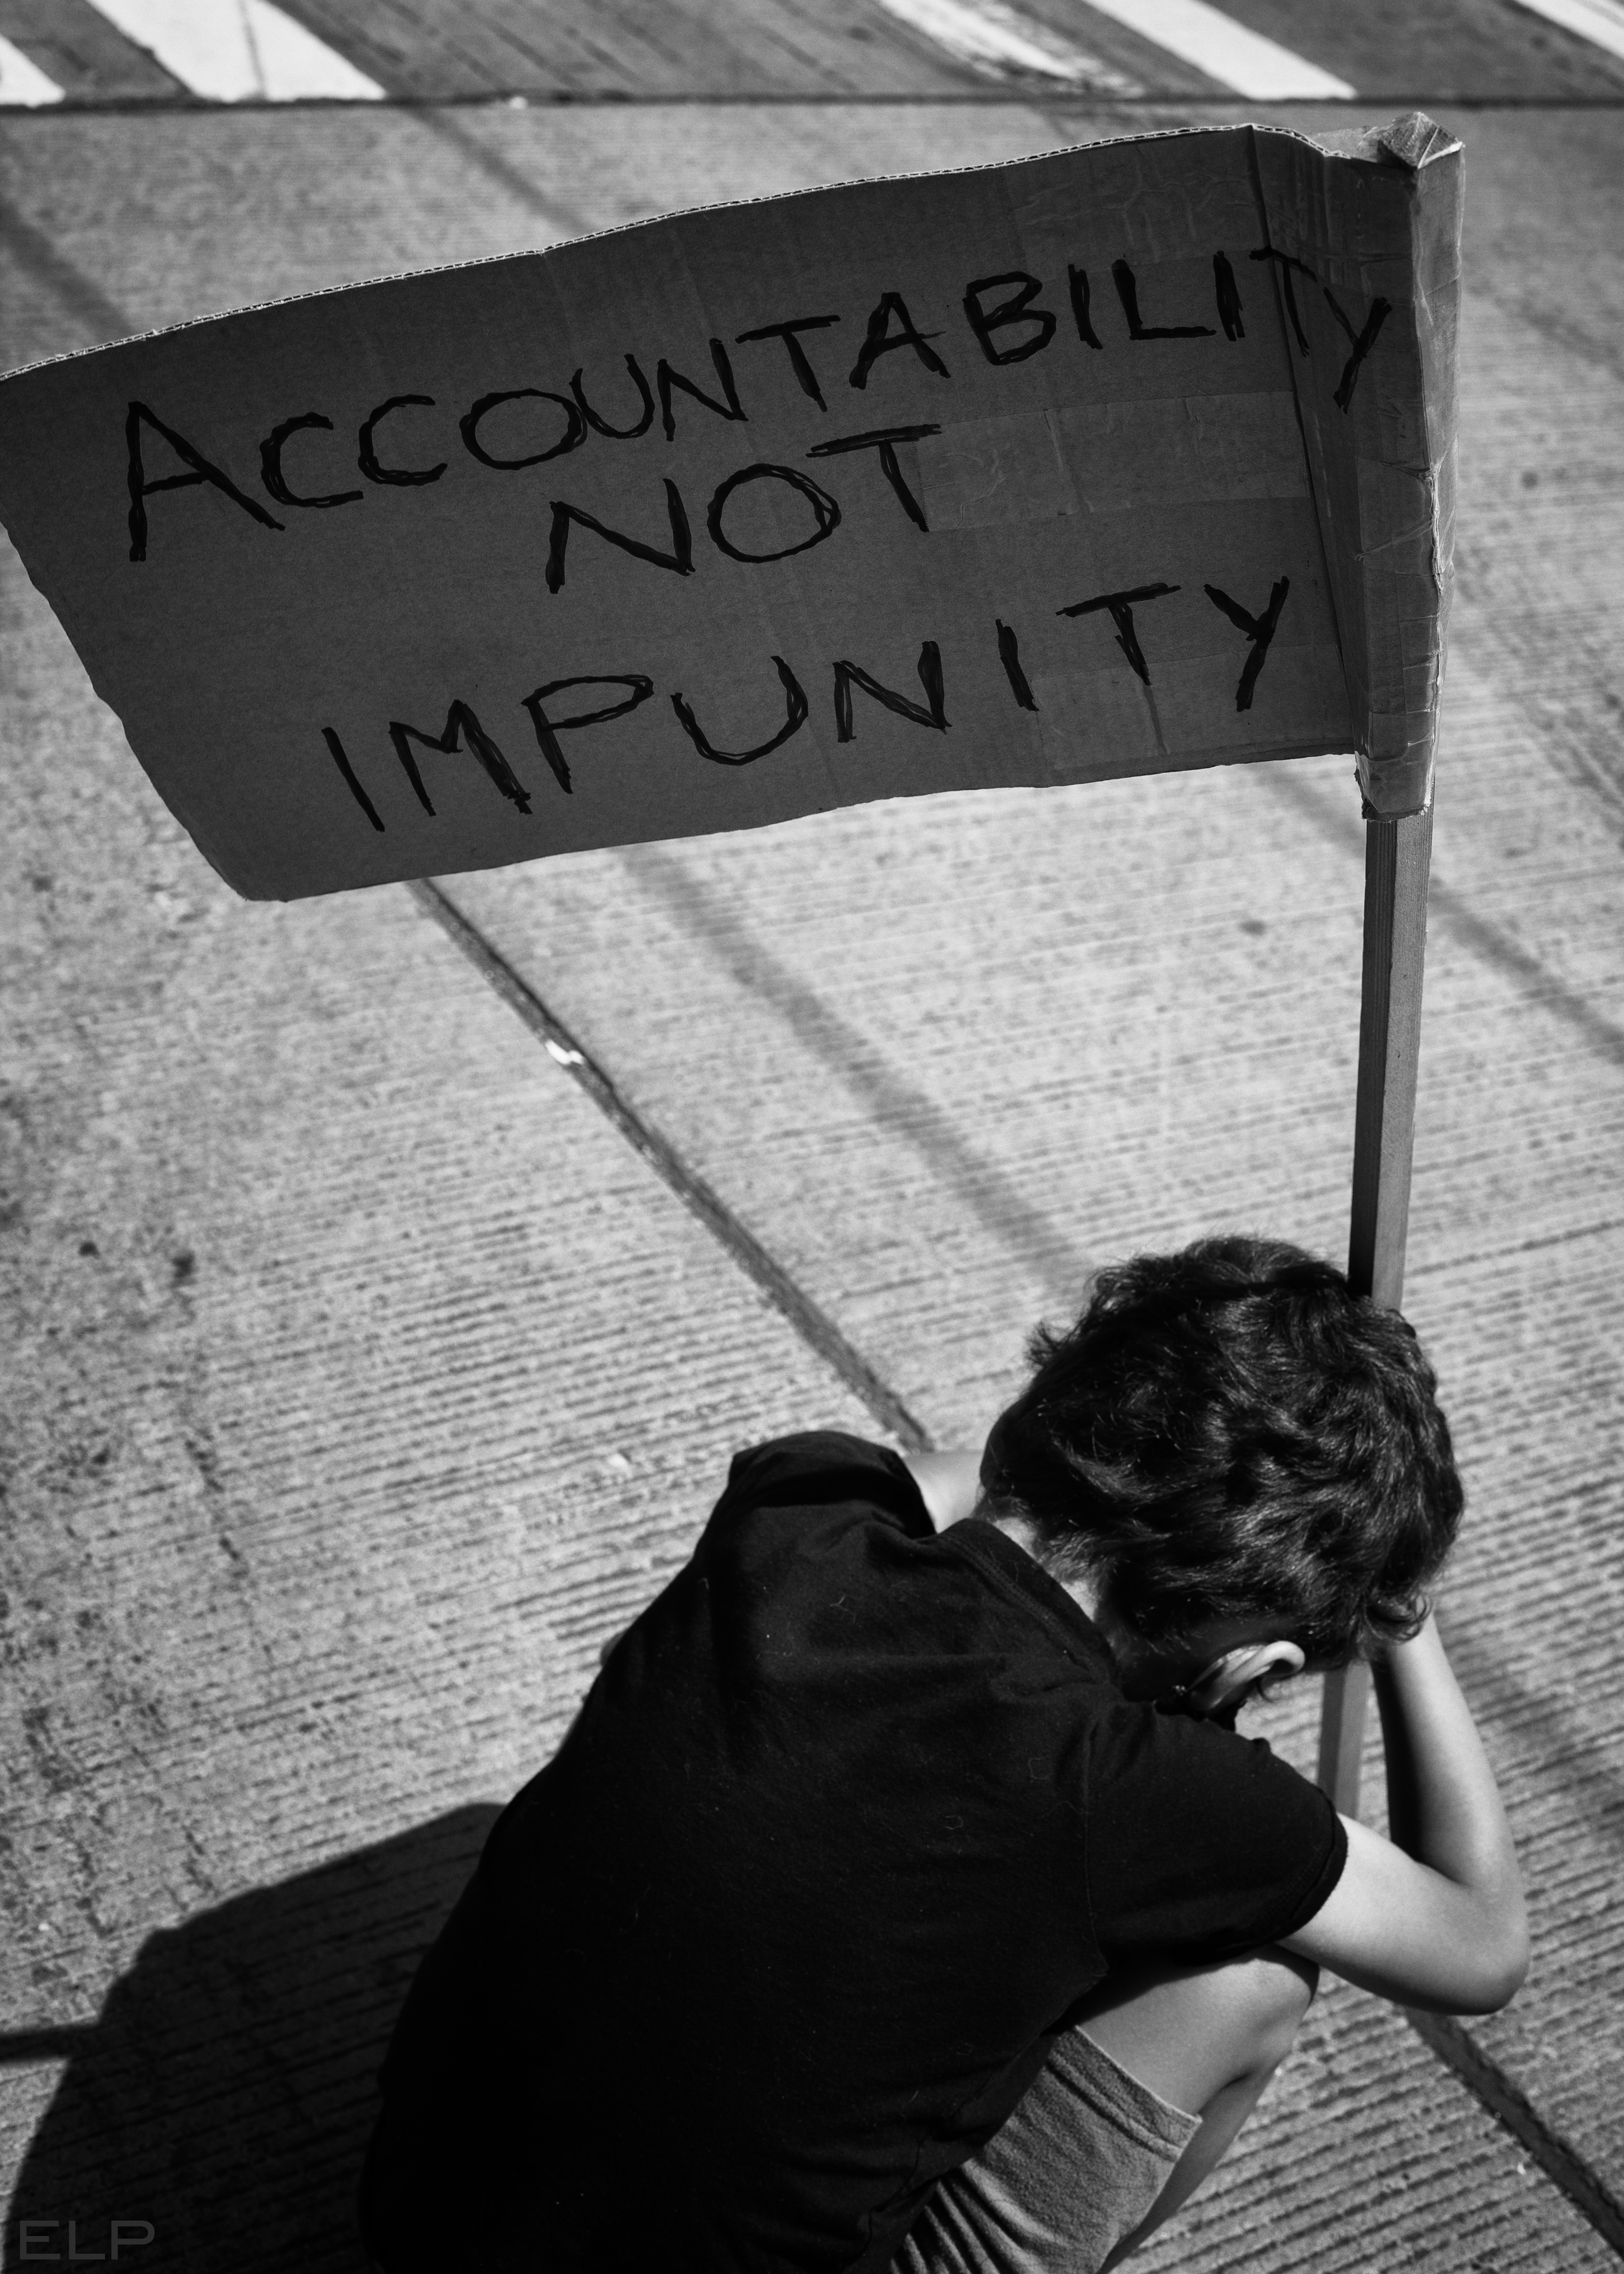 Fourth of Youly event child holding sign saying accountability not impunity